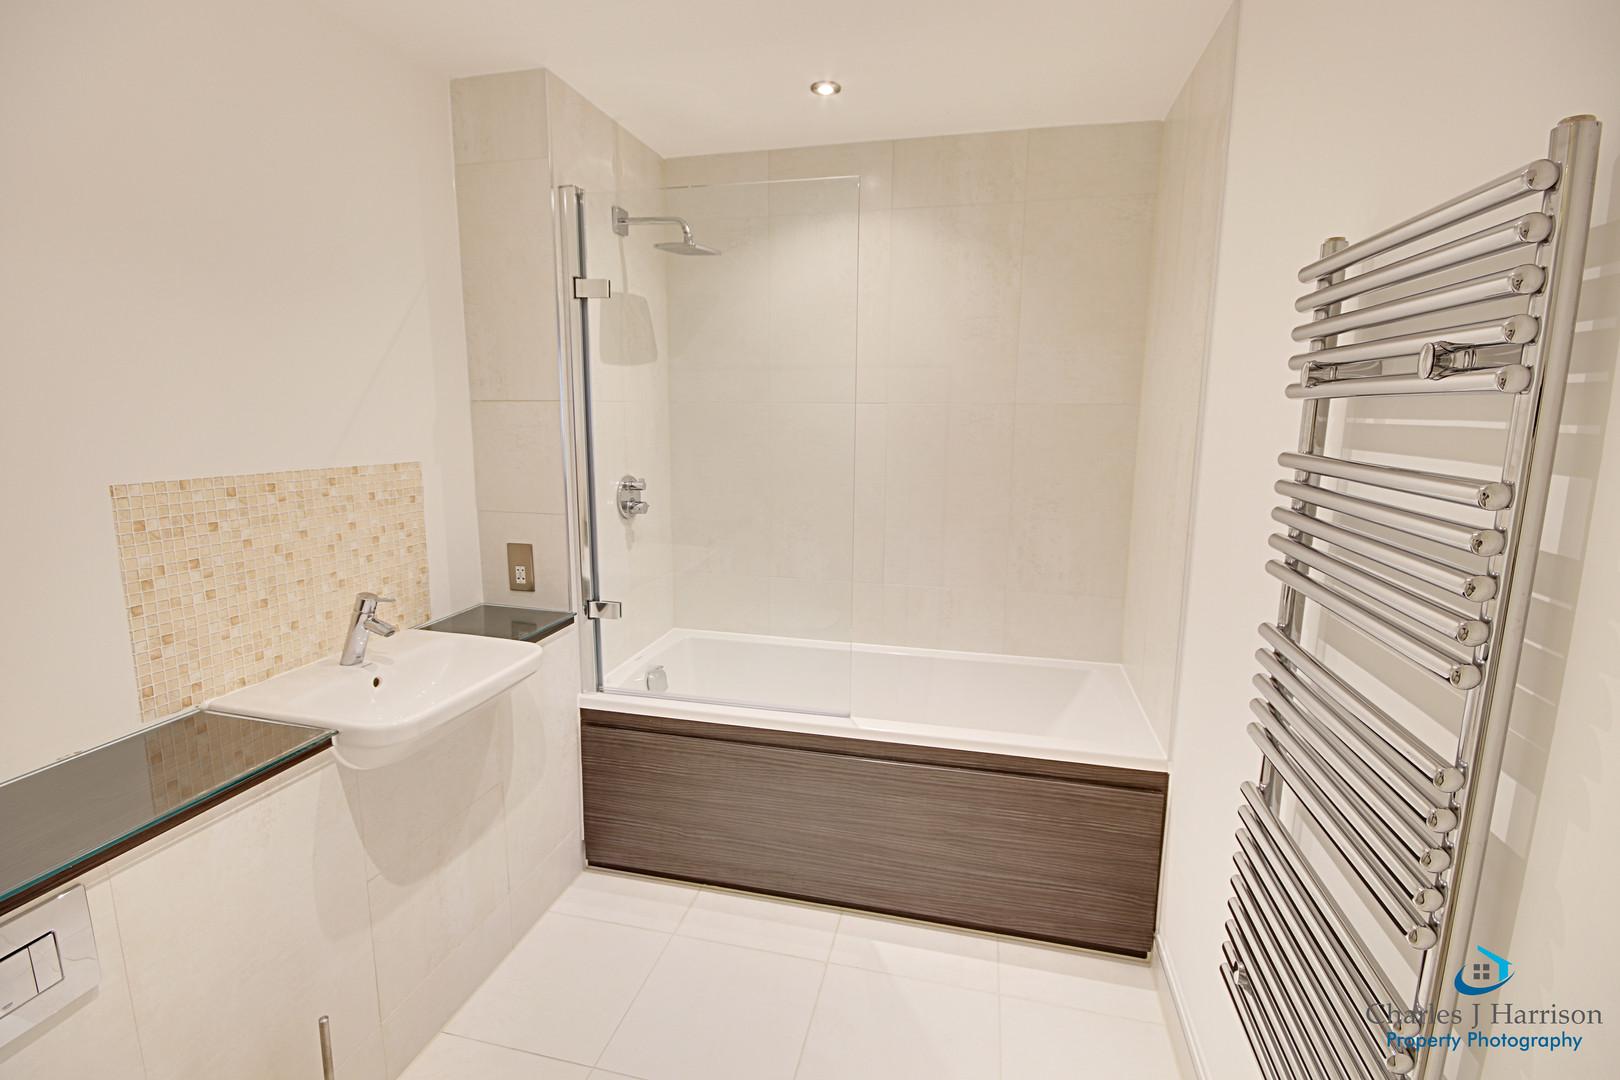 35 Scholars - Bathroom - Copy (2).jpg